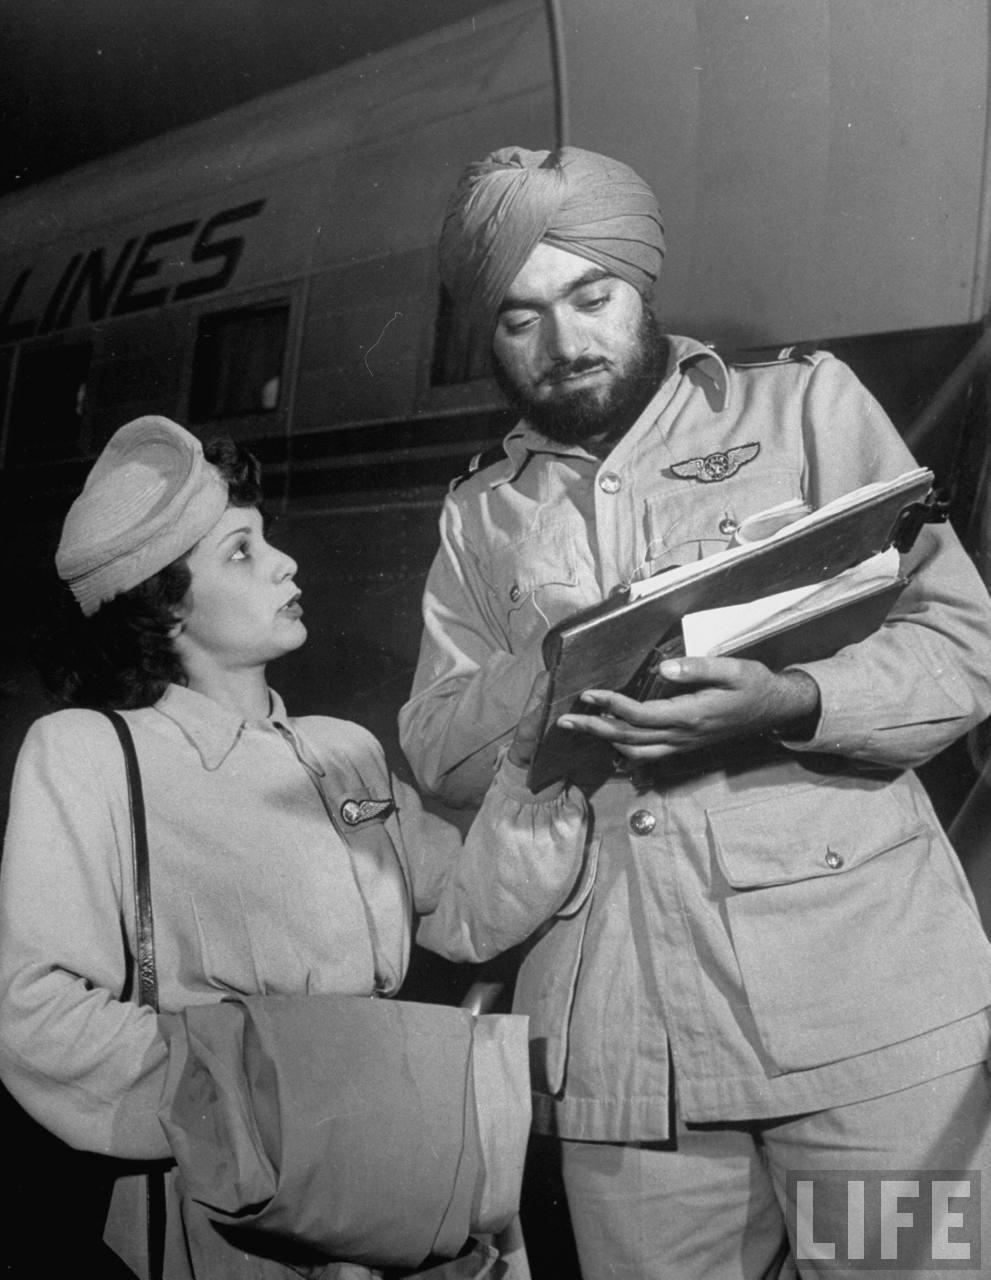 Air India flight attendant Monica Gilbert (L) collecting autograph of publicity dir. Qasi Isa after flight.